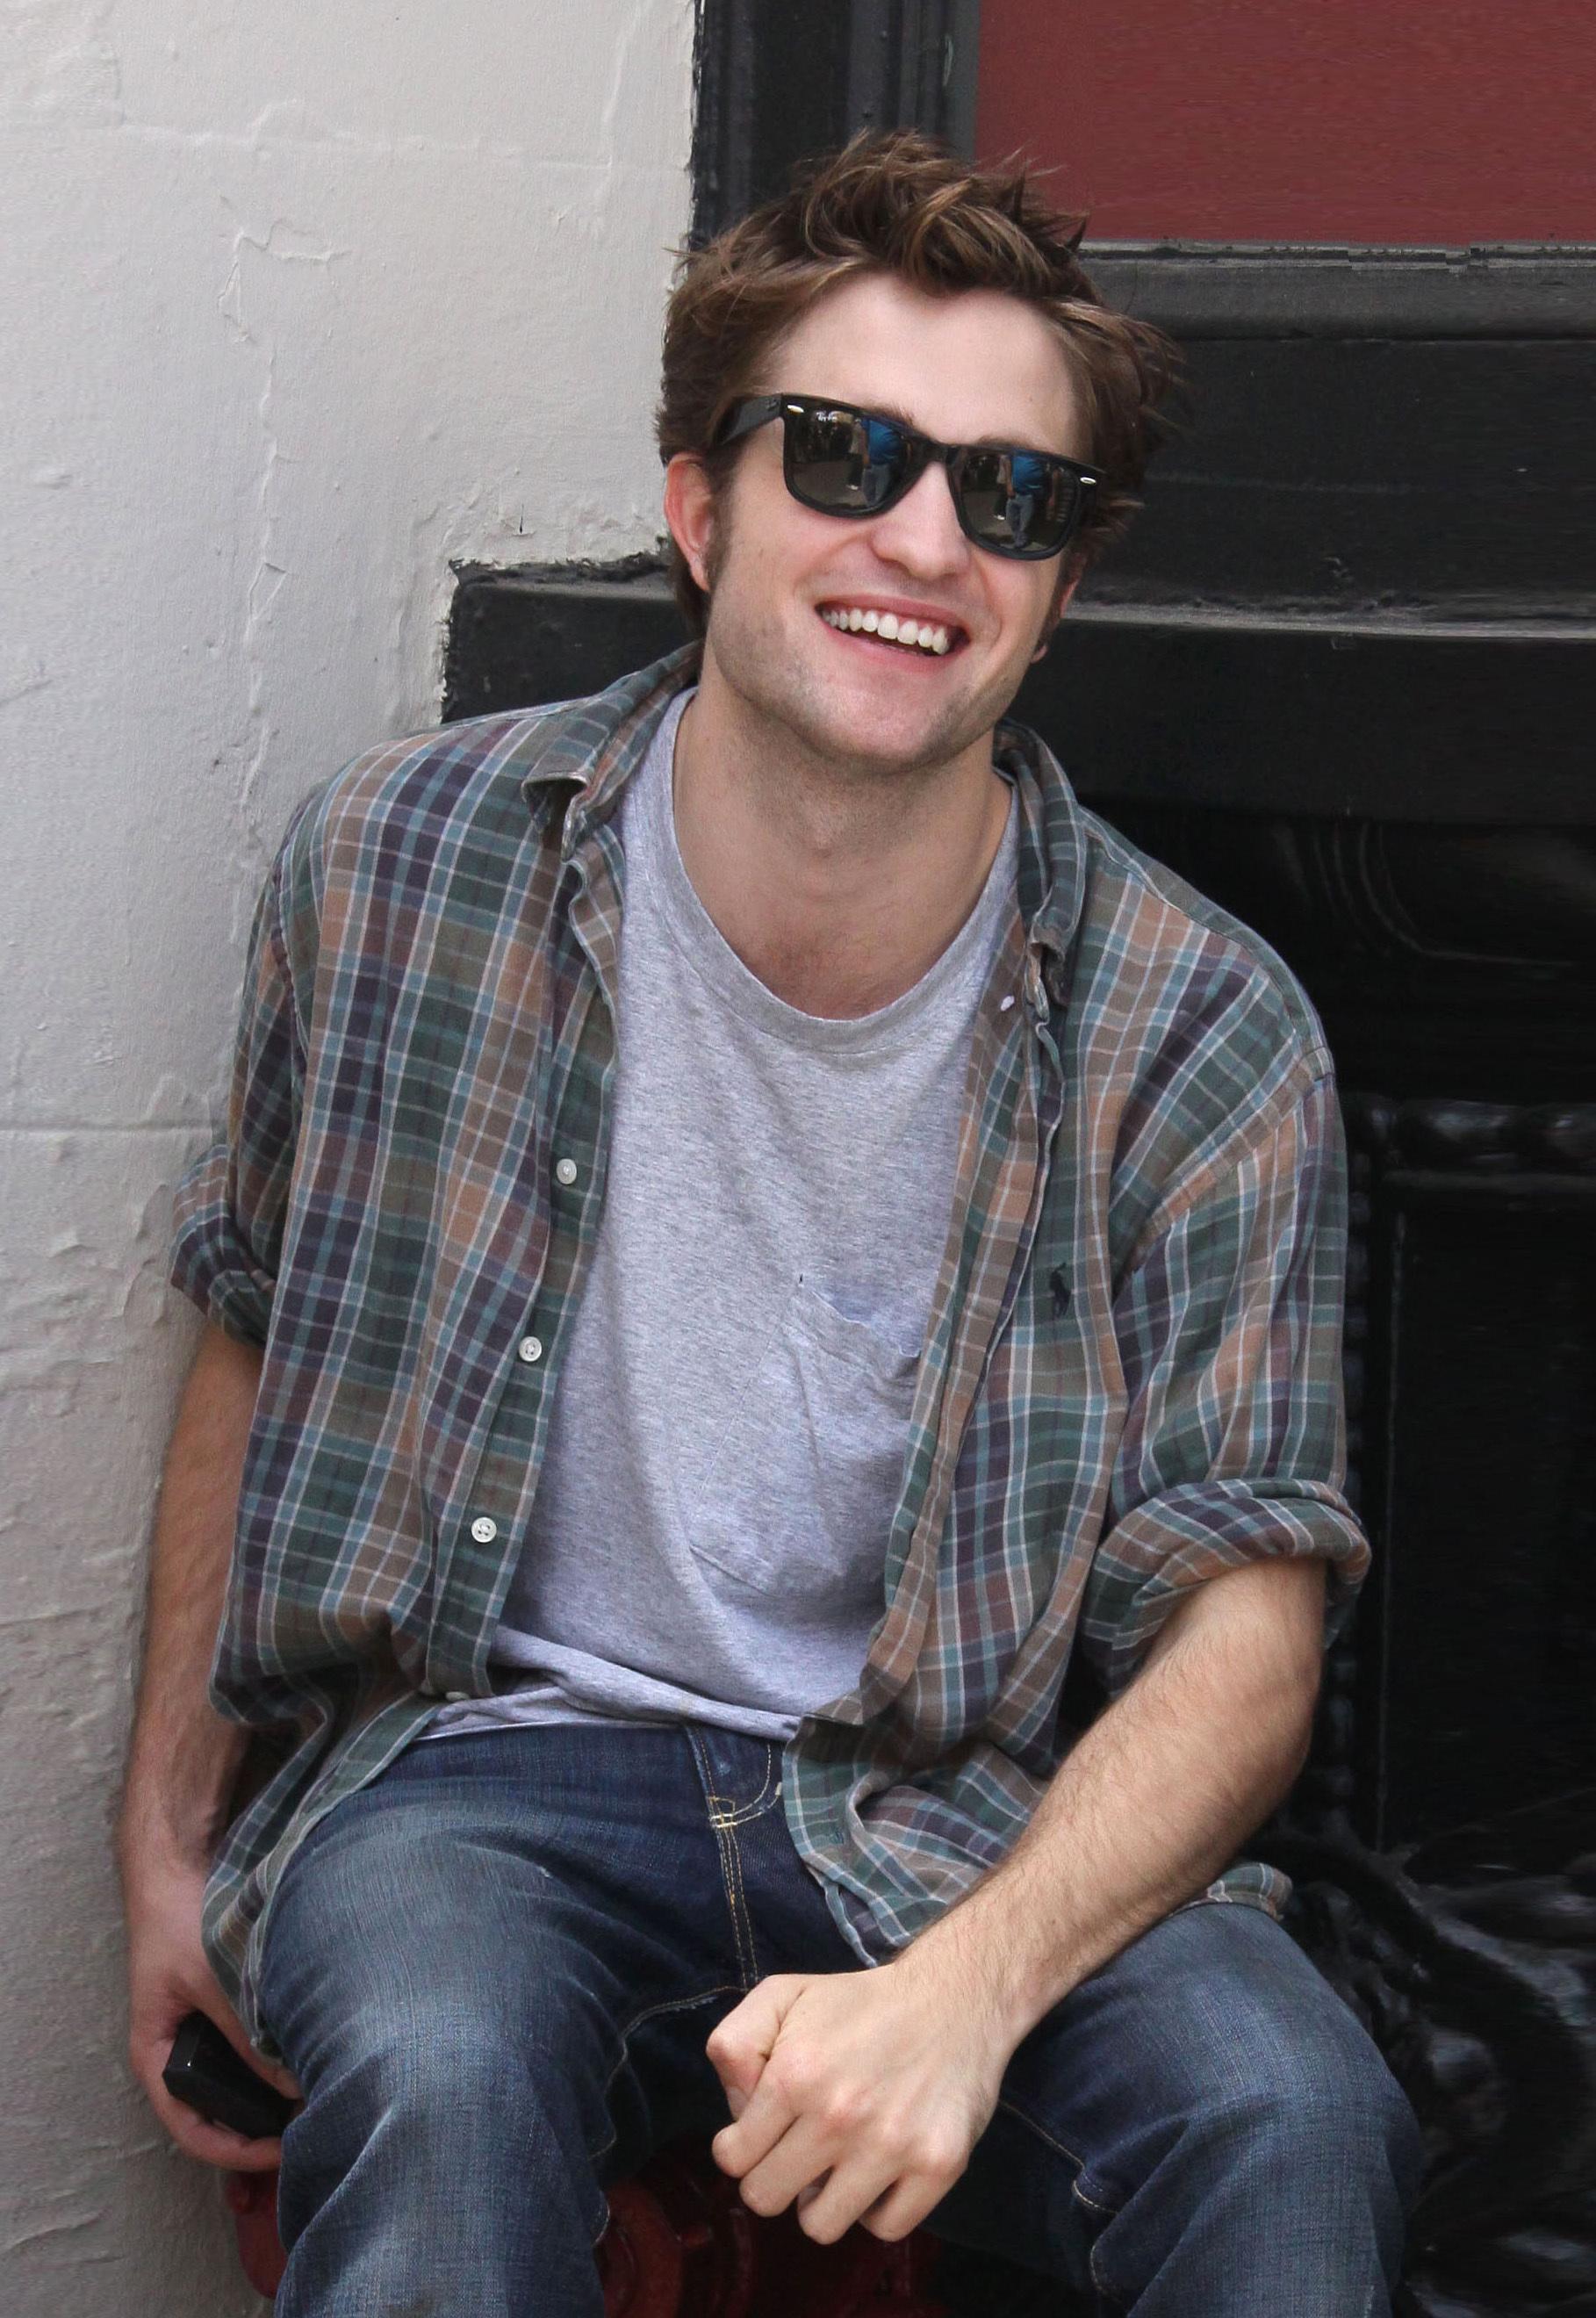 FP_3157269_Pattinson_Robert_NYC_061509